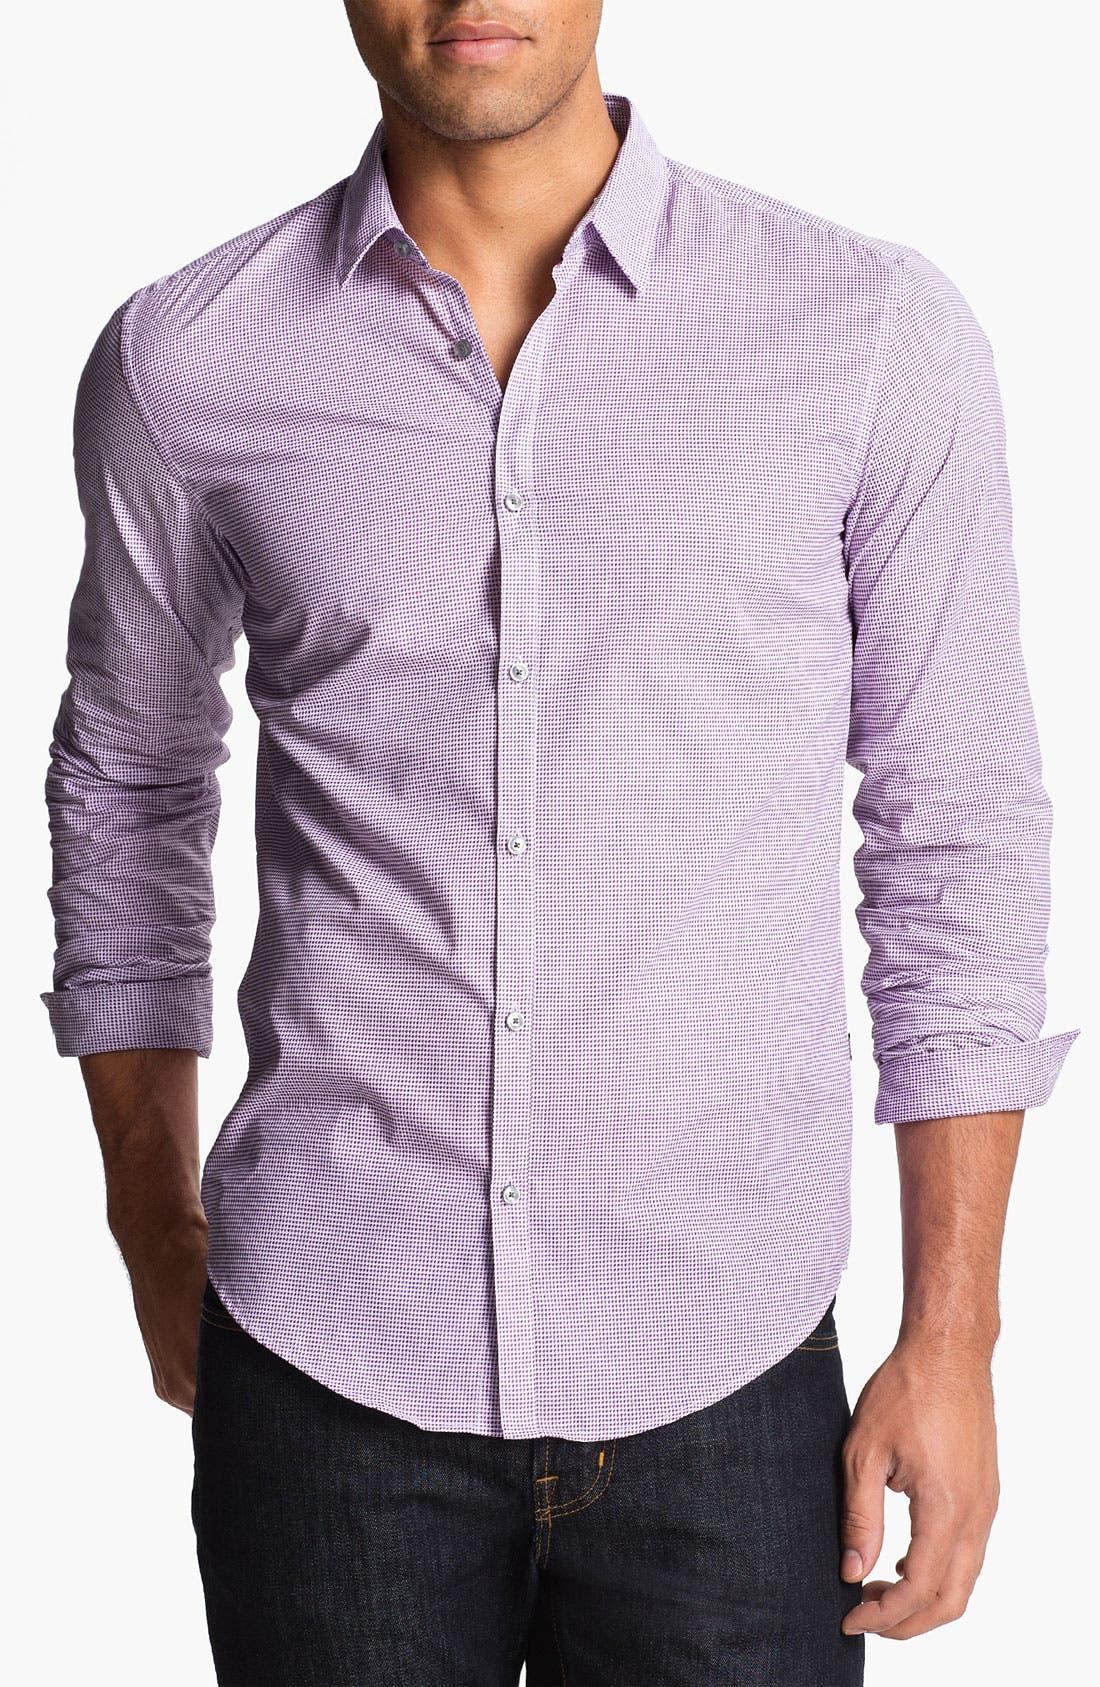 Main Image - BOSS HUGO BOSS 'Remus' Slim Fit Sport Shirt